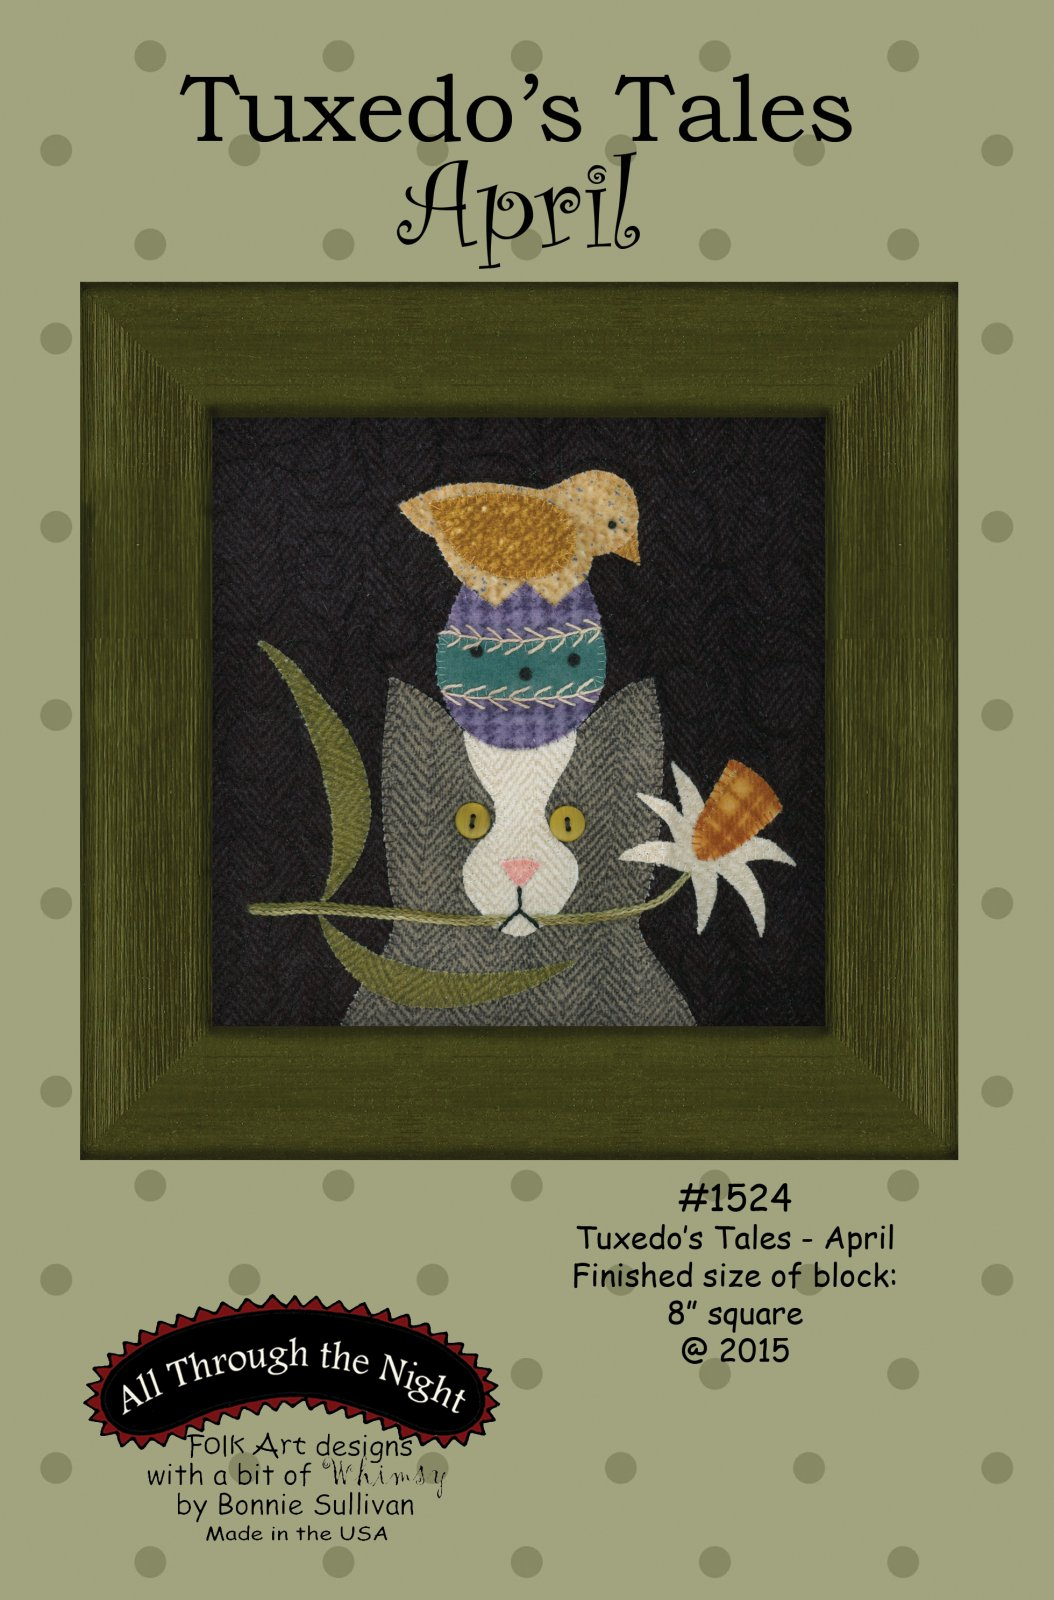 1524 Tuxedo's Tales April